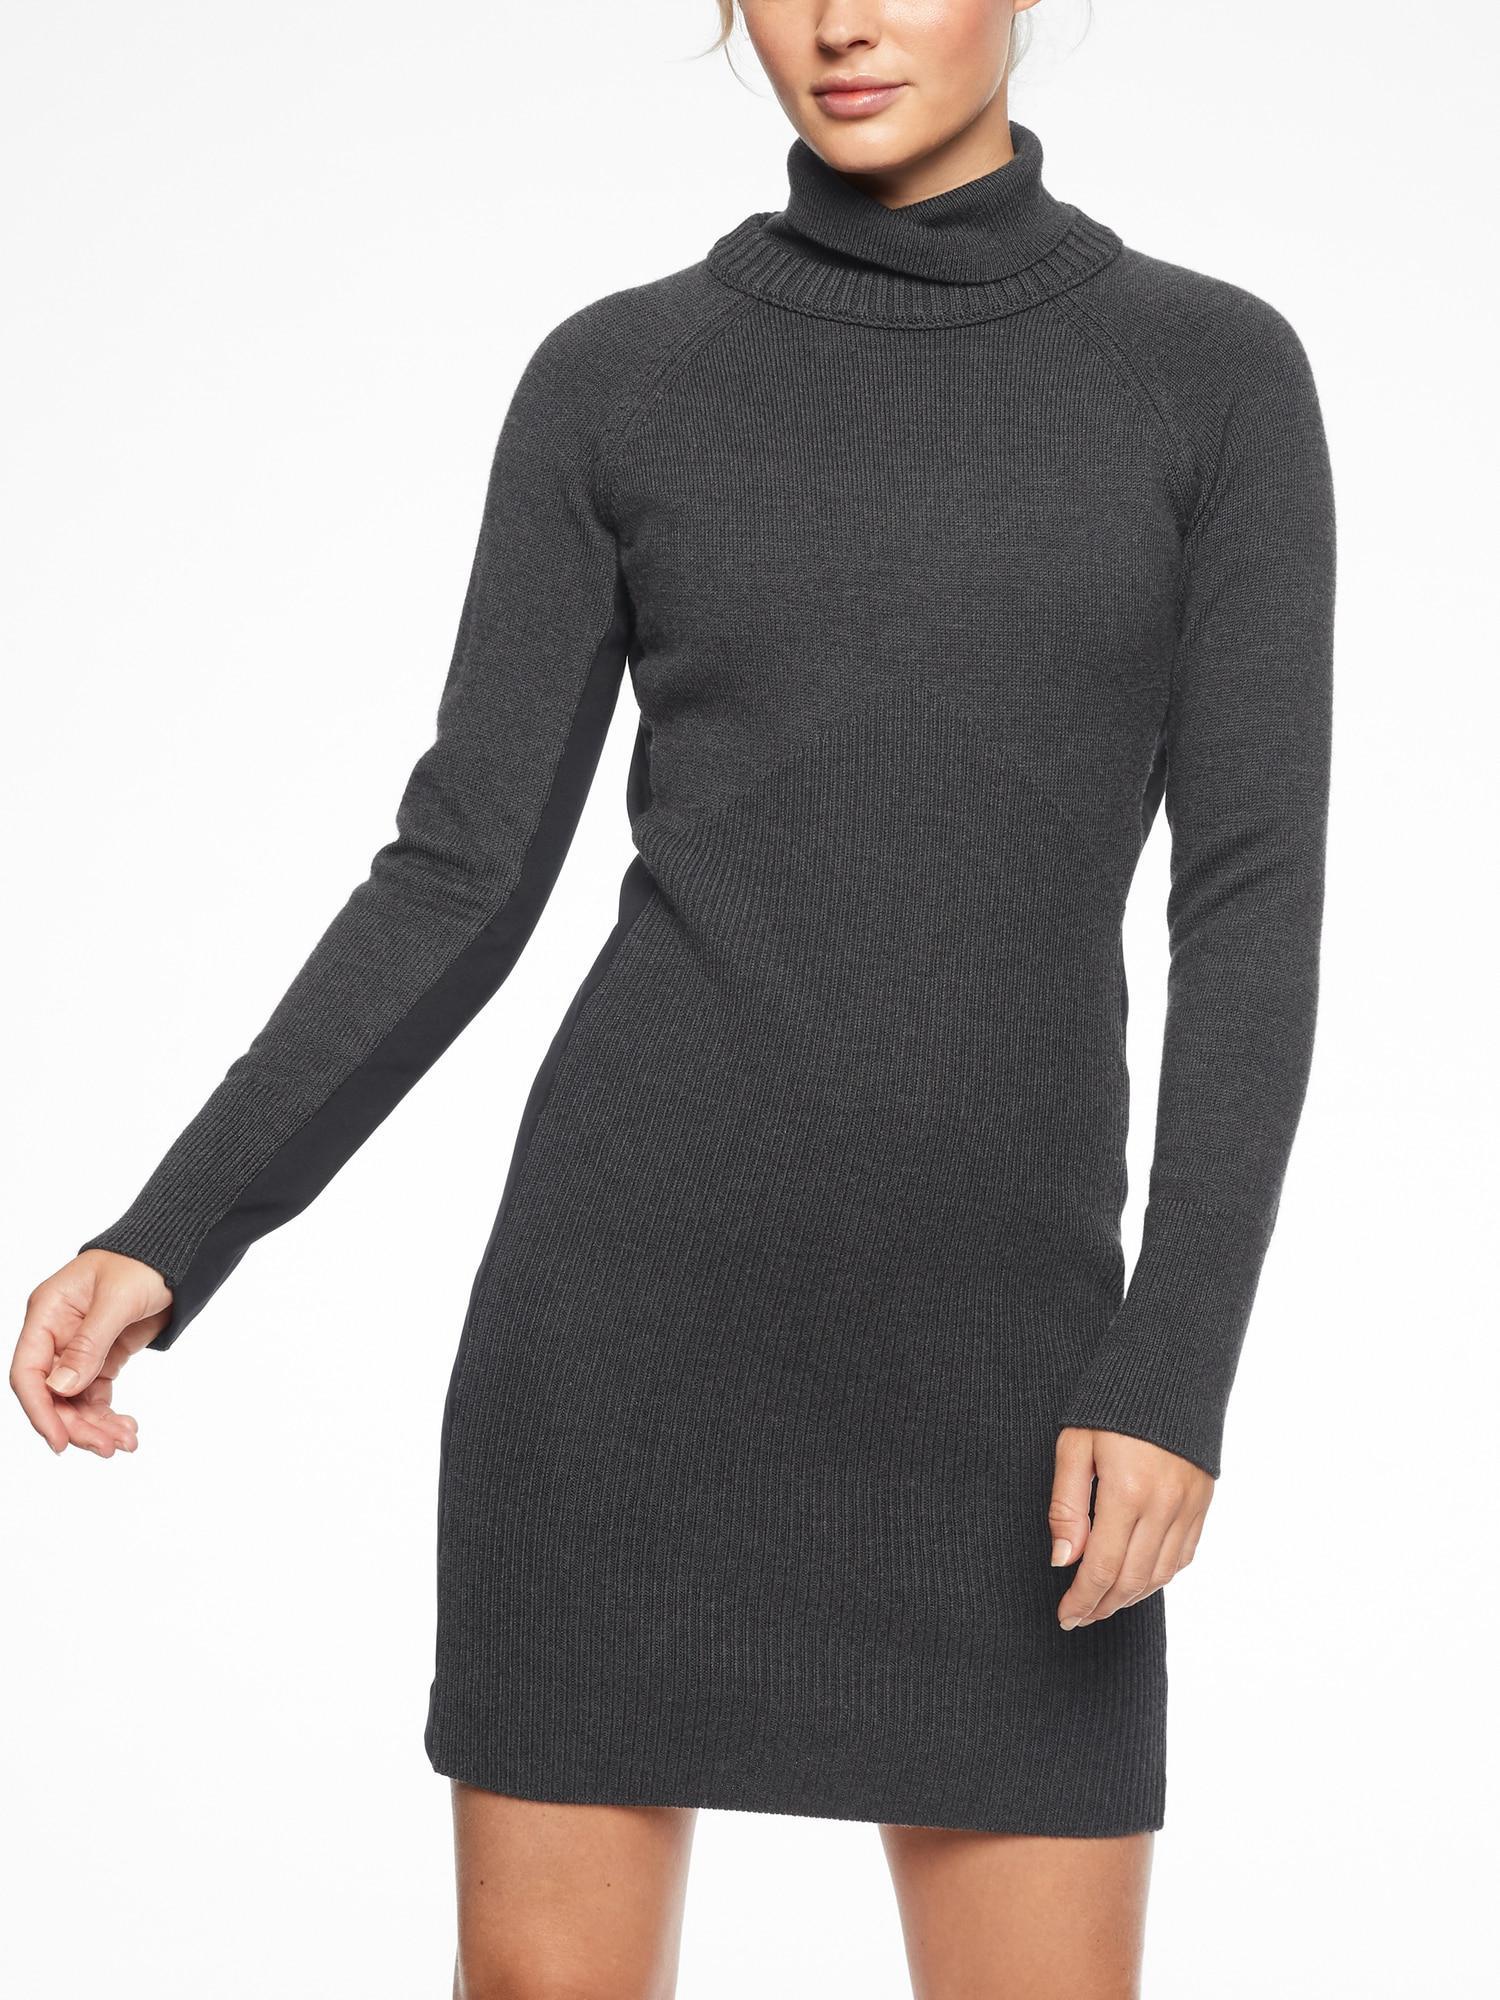 74f43989317 Athleta Mesa Hybrid Sweater Dress in Gray - Lyst